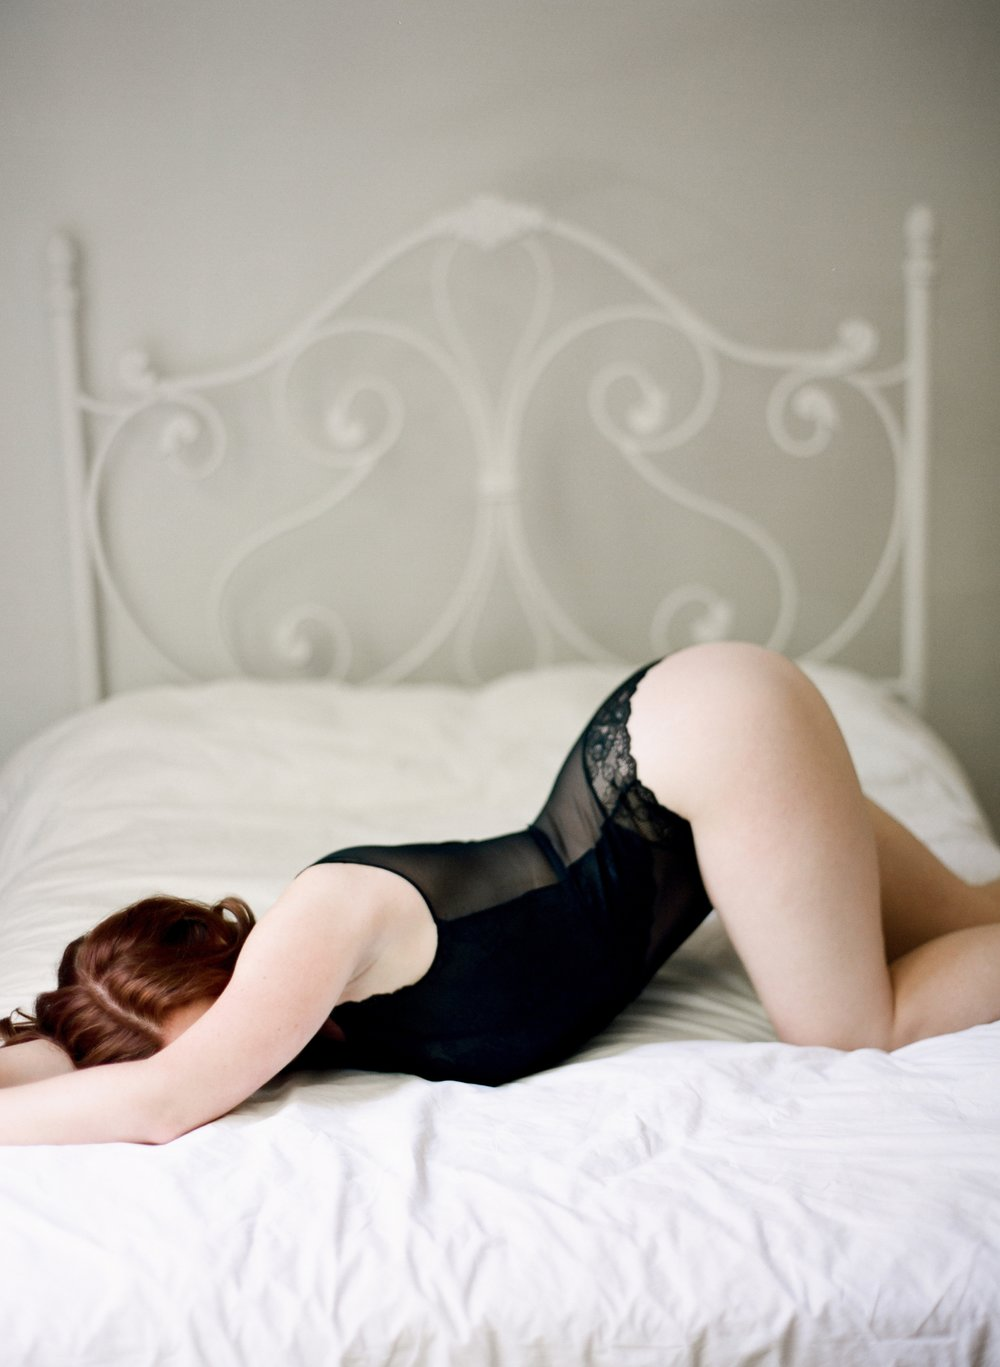 tallahassee_boudoir_photographer_shannon_griffin_0011.jpg